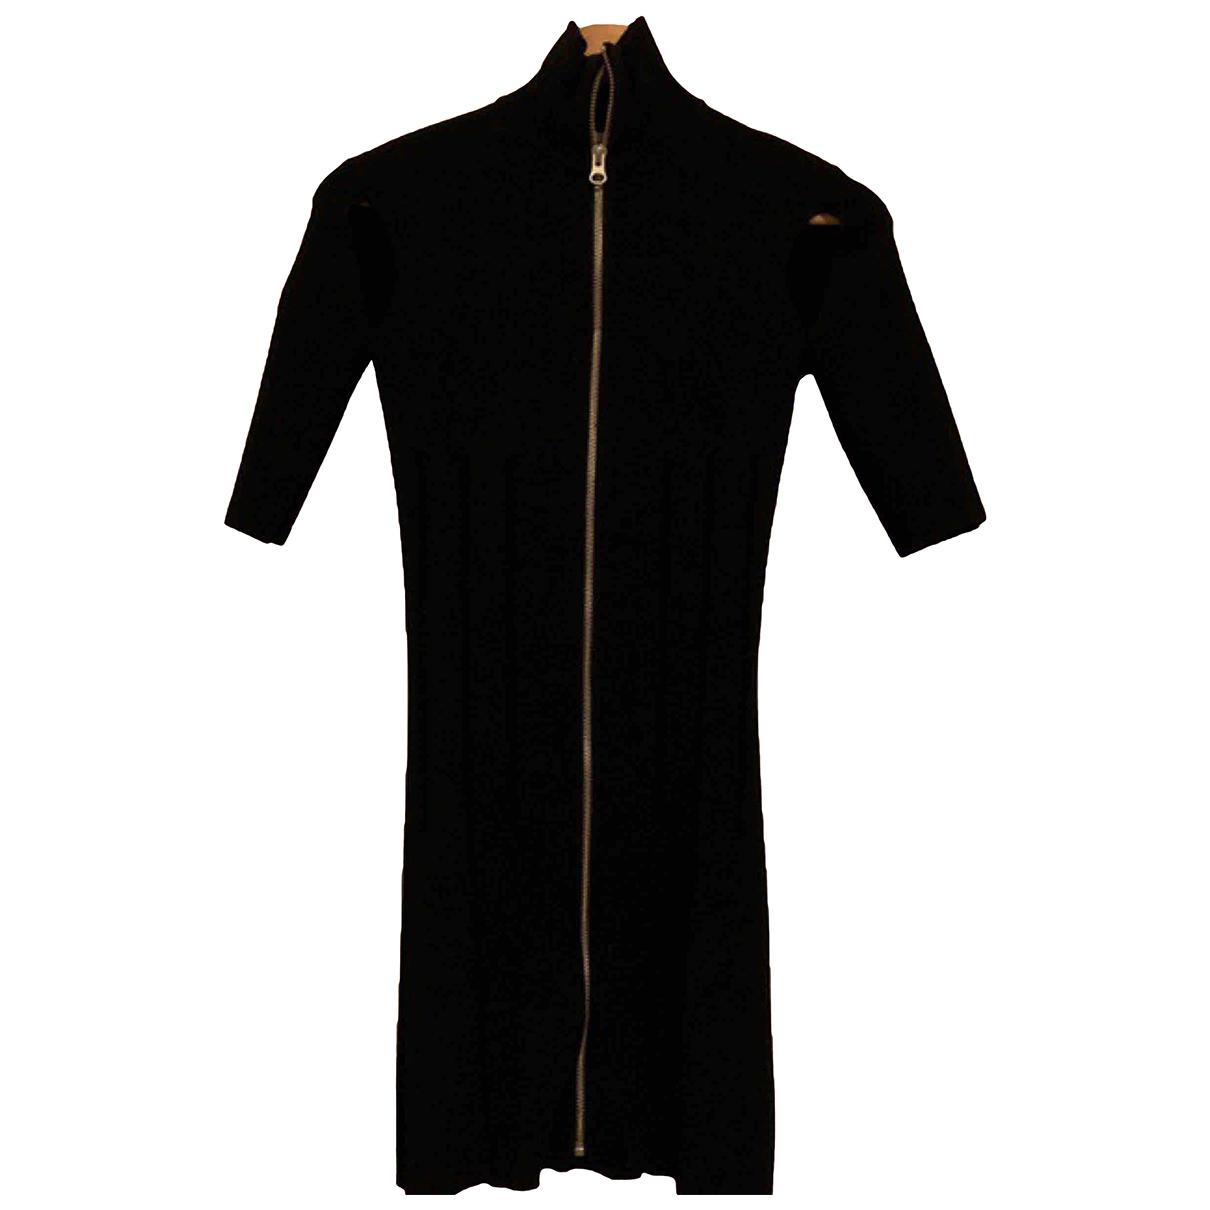 Mcq N Black Wool dress for Women 6 UK